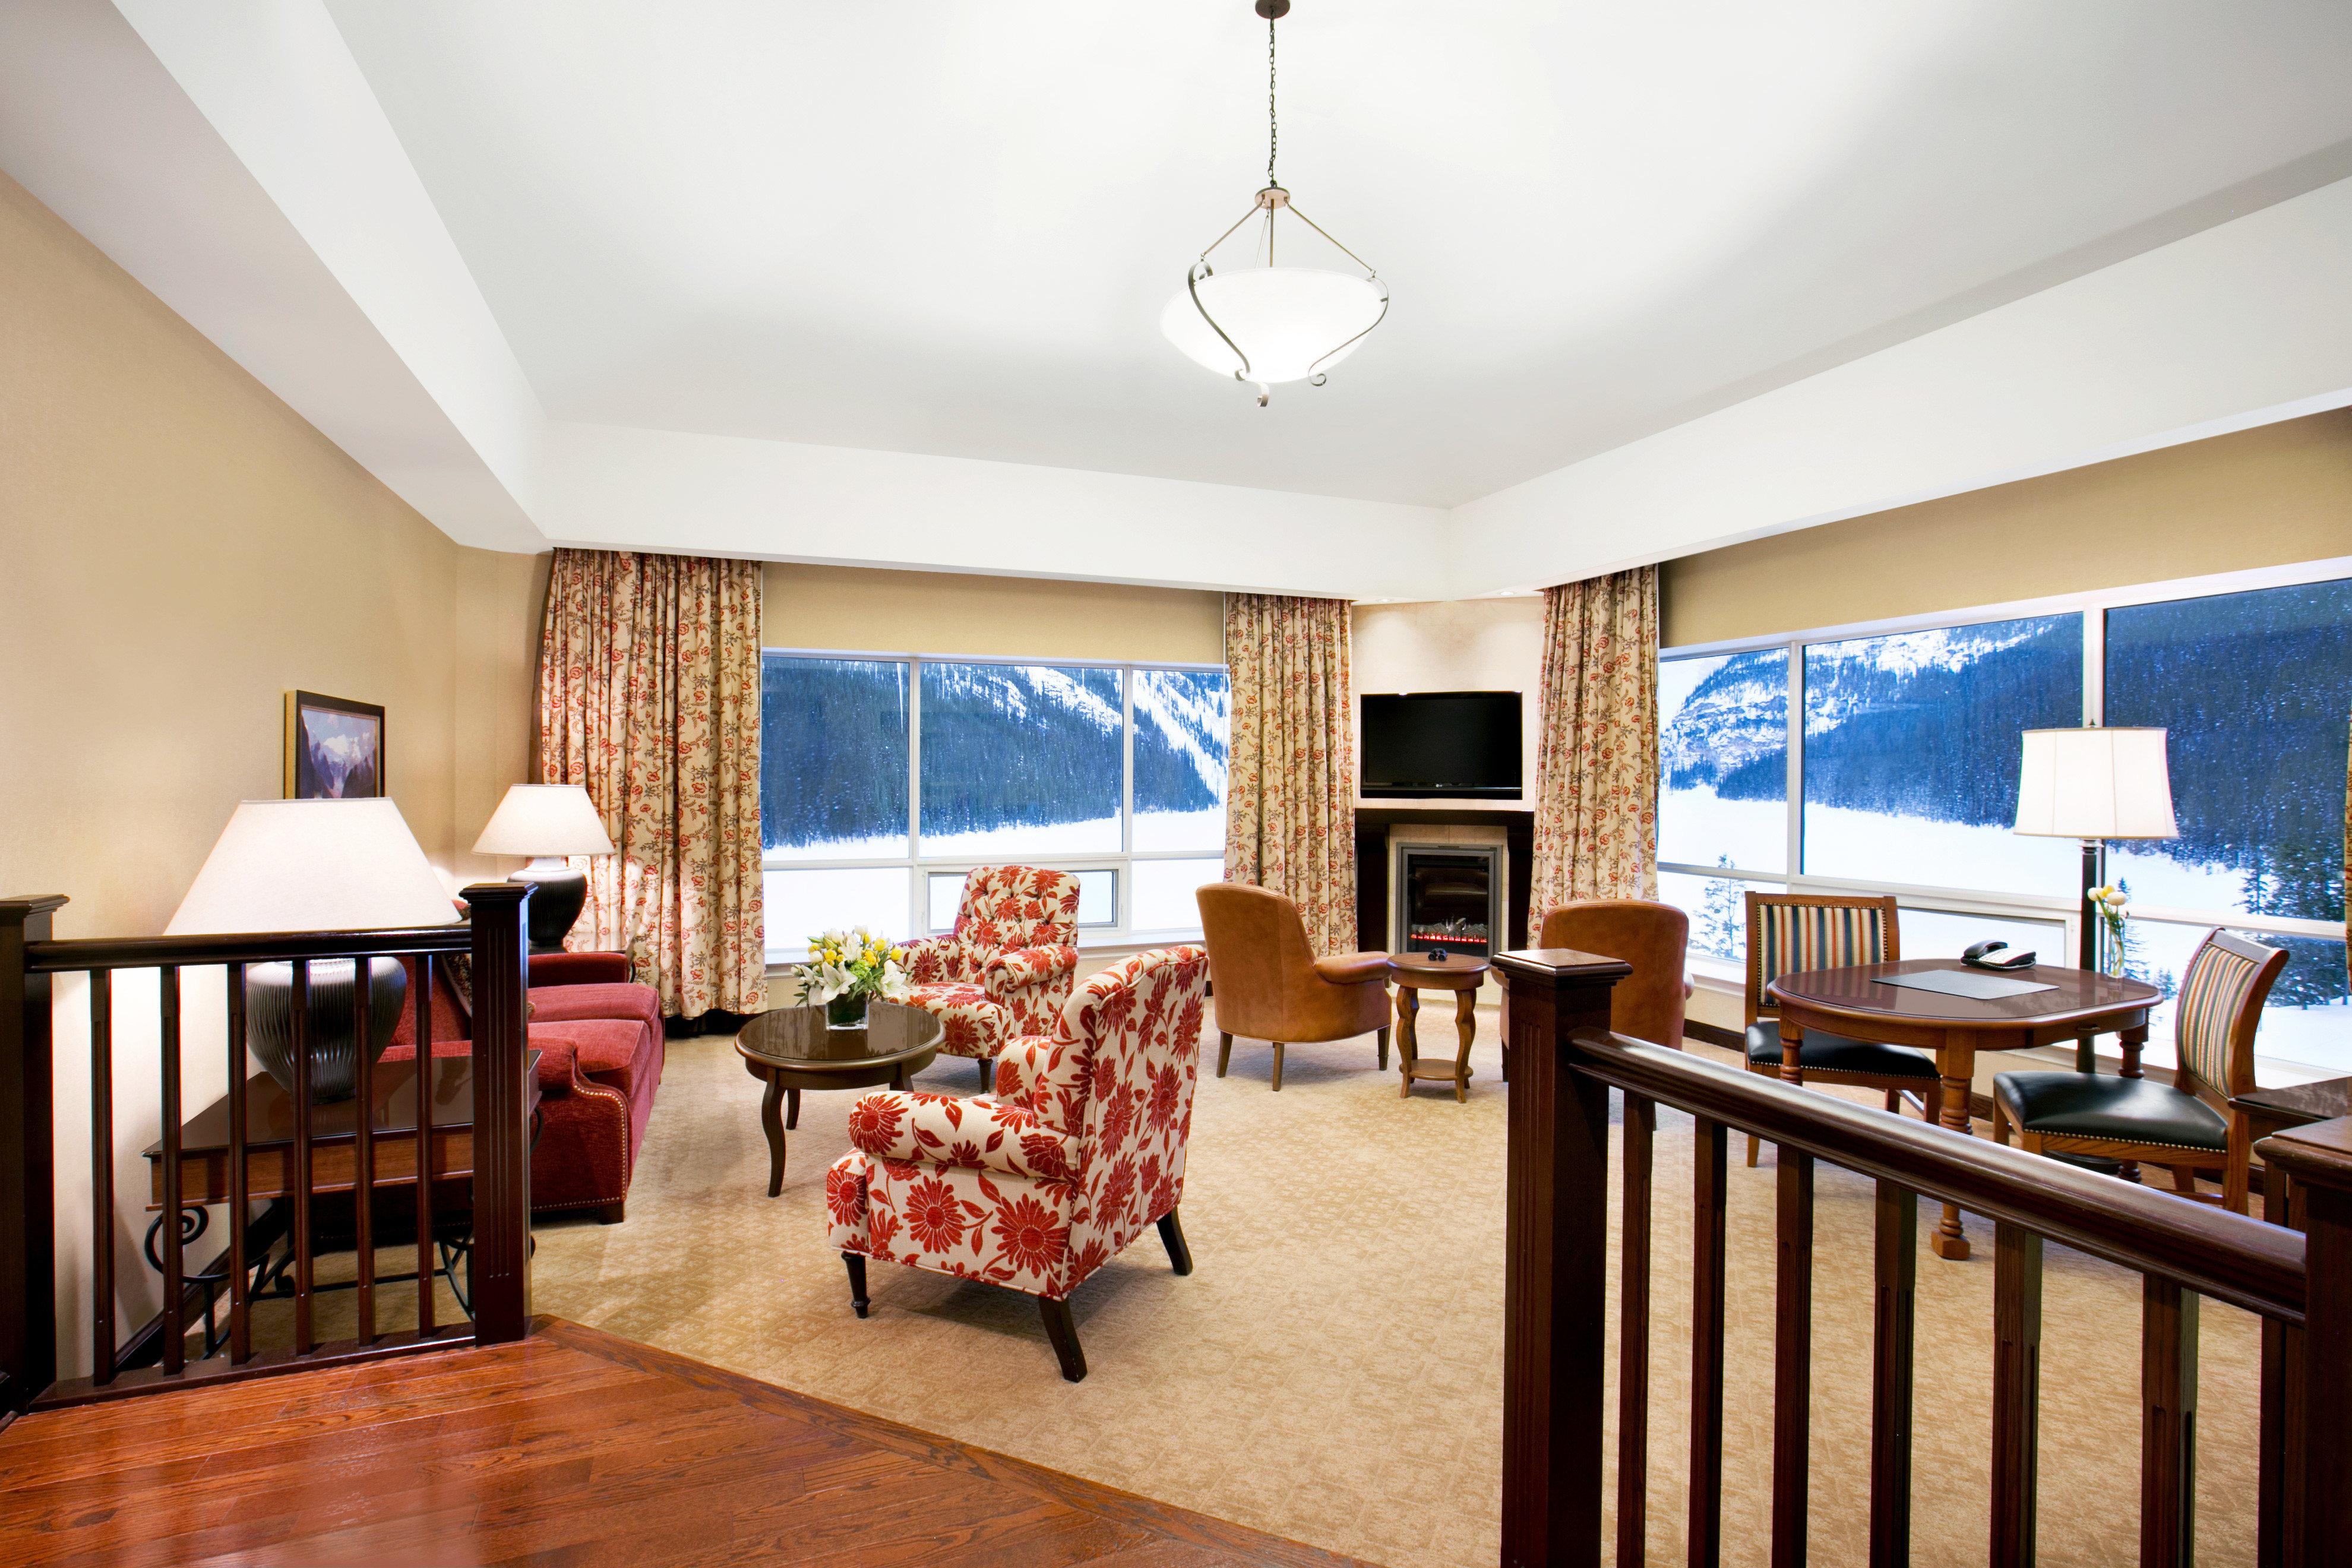 Entertainment Modern Resort Scenic views property living room home Suite cottage Villa condominium Bedroom